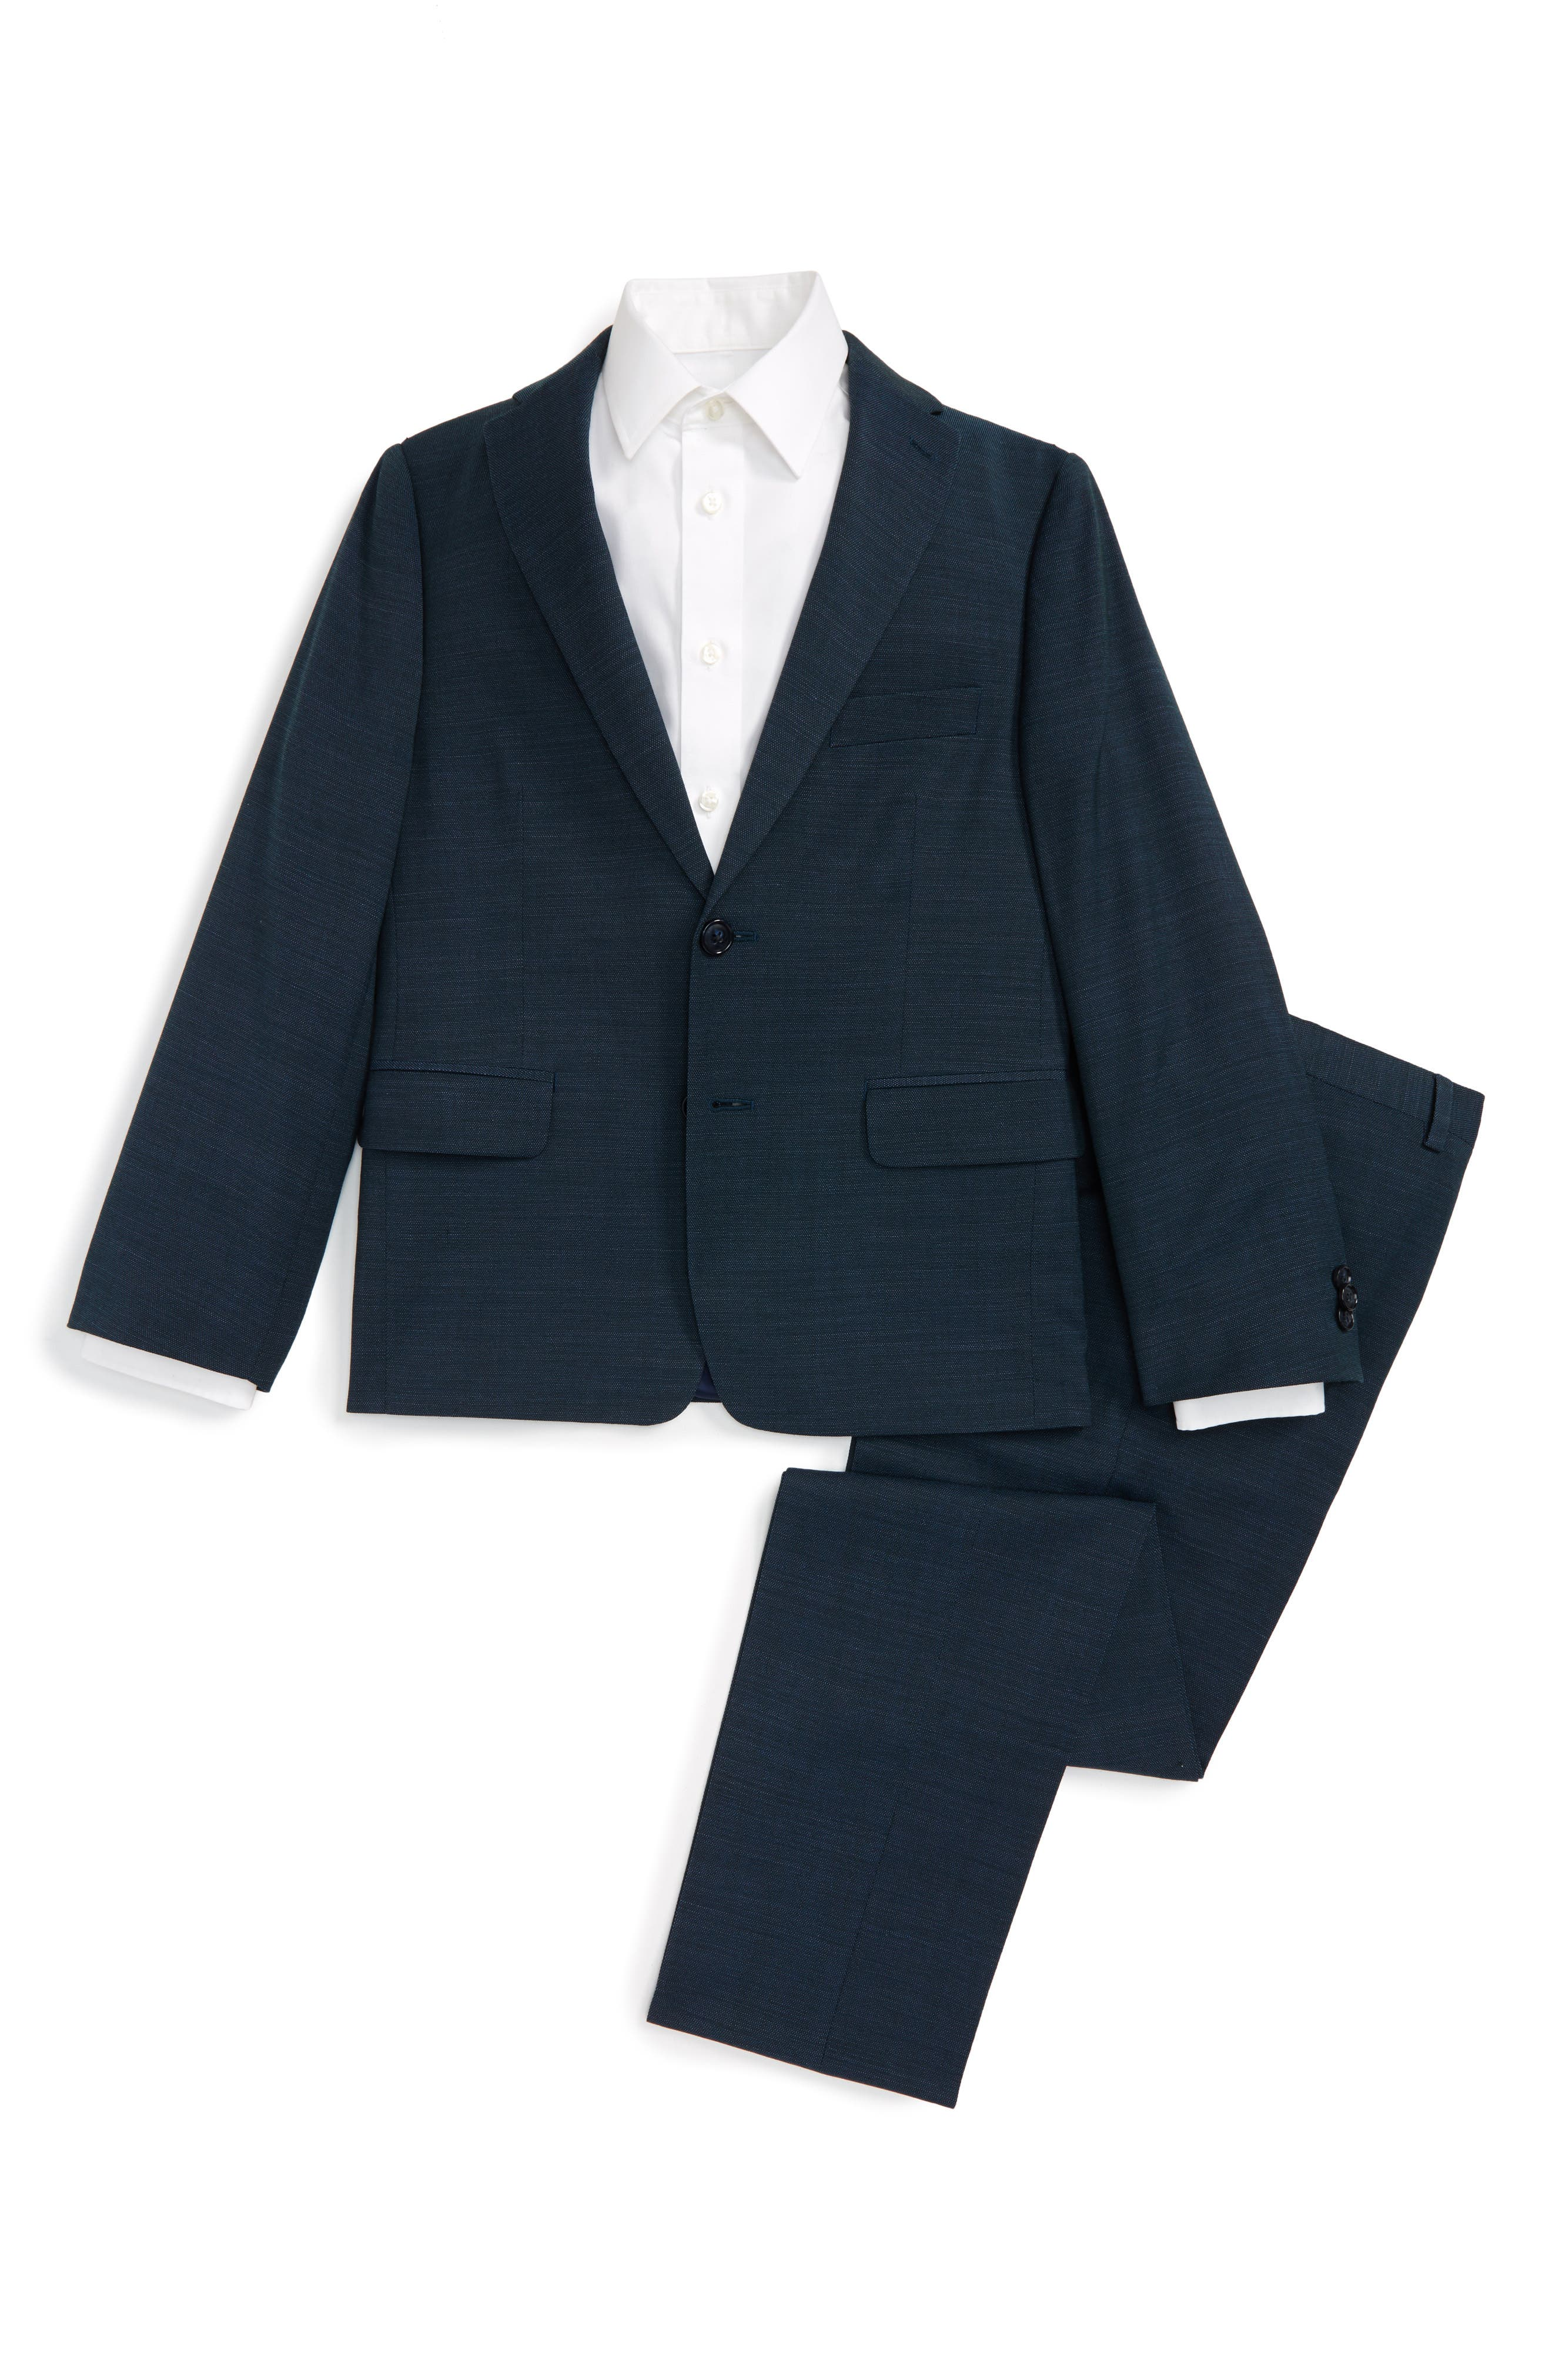 MICHAEL KORS Birds Eye Stretch Wool Suit